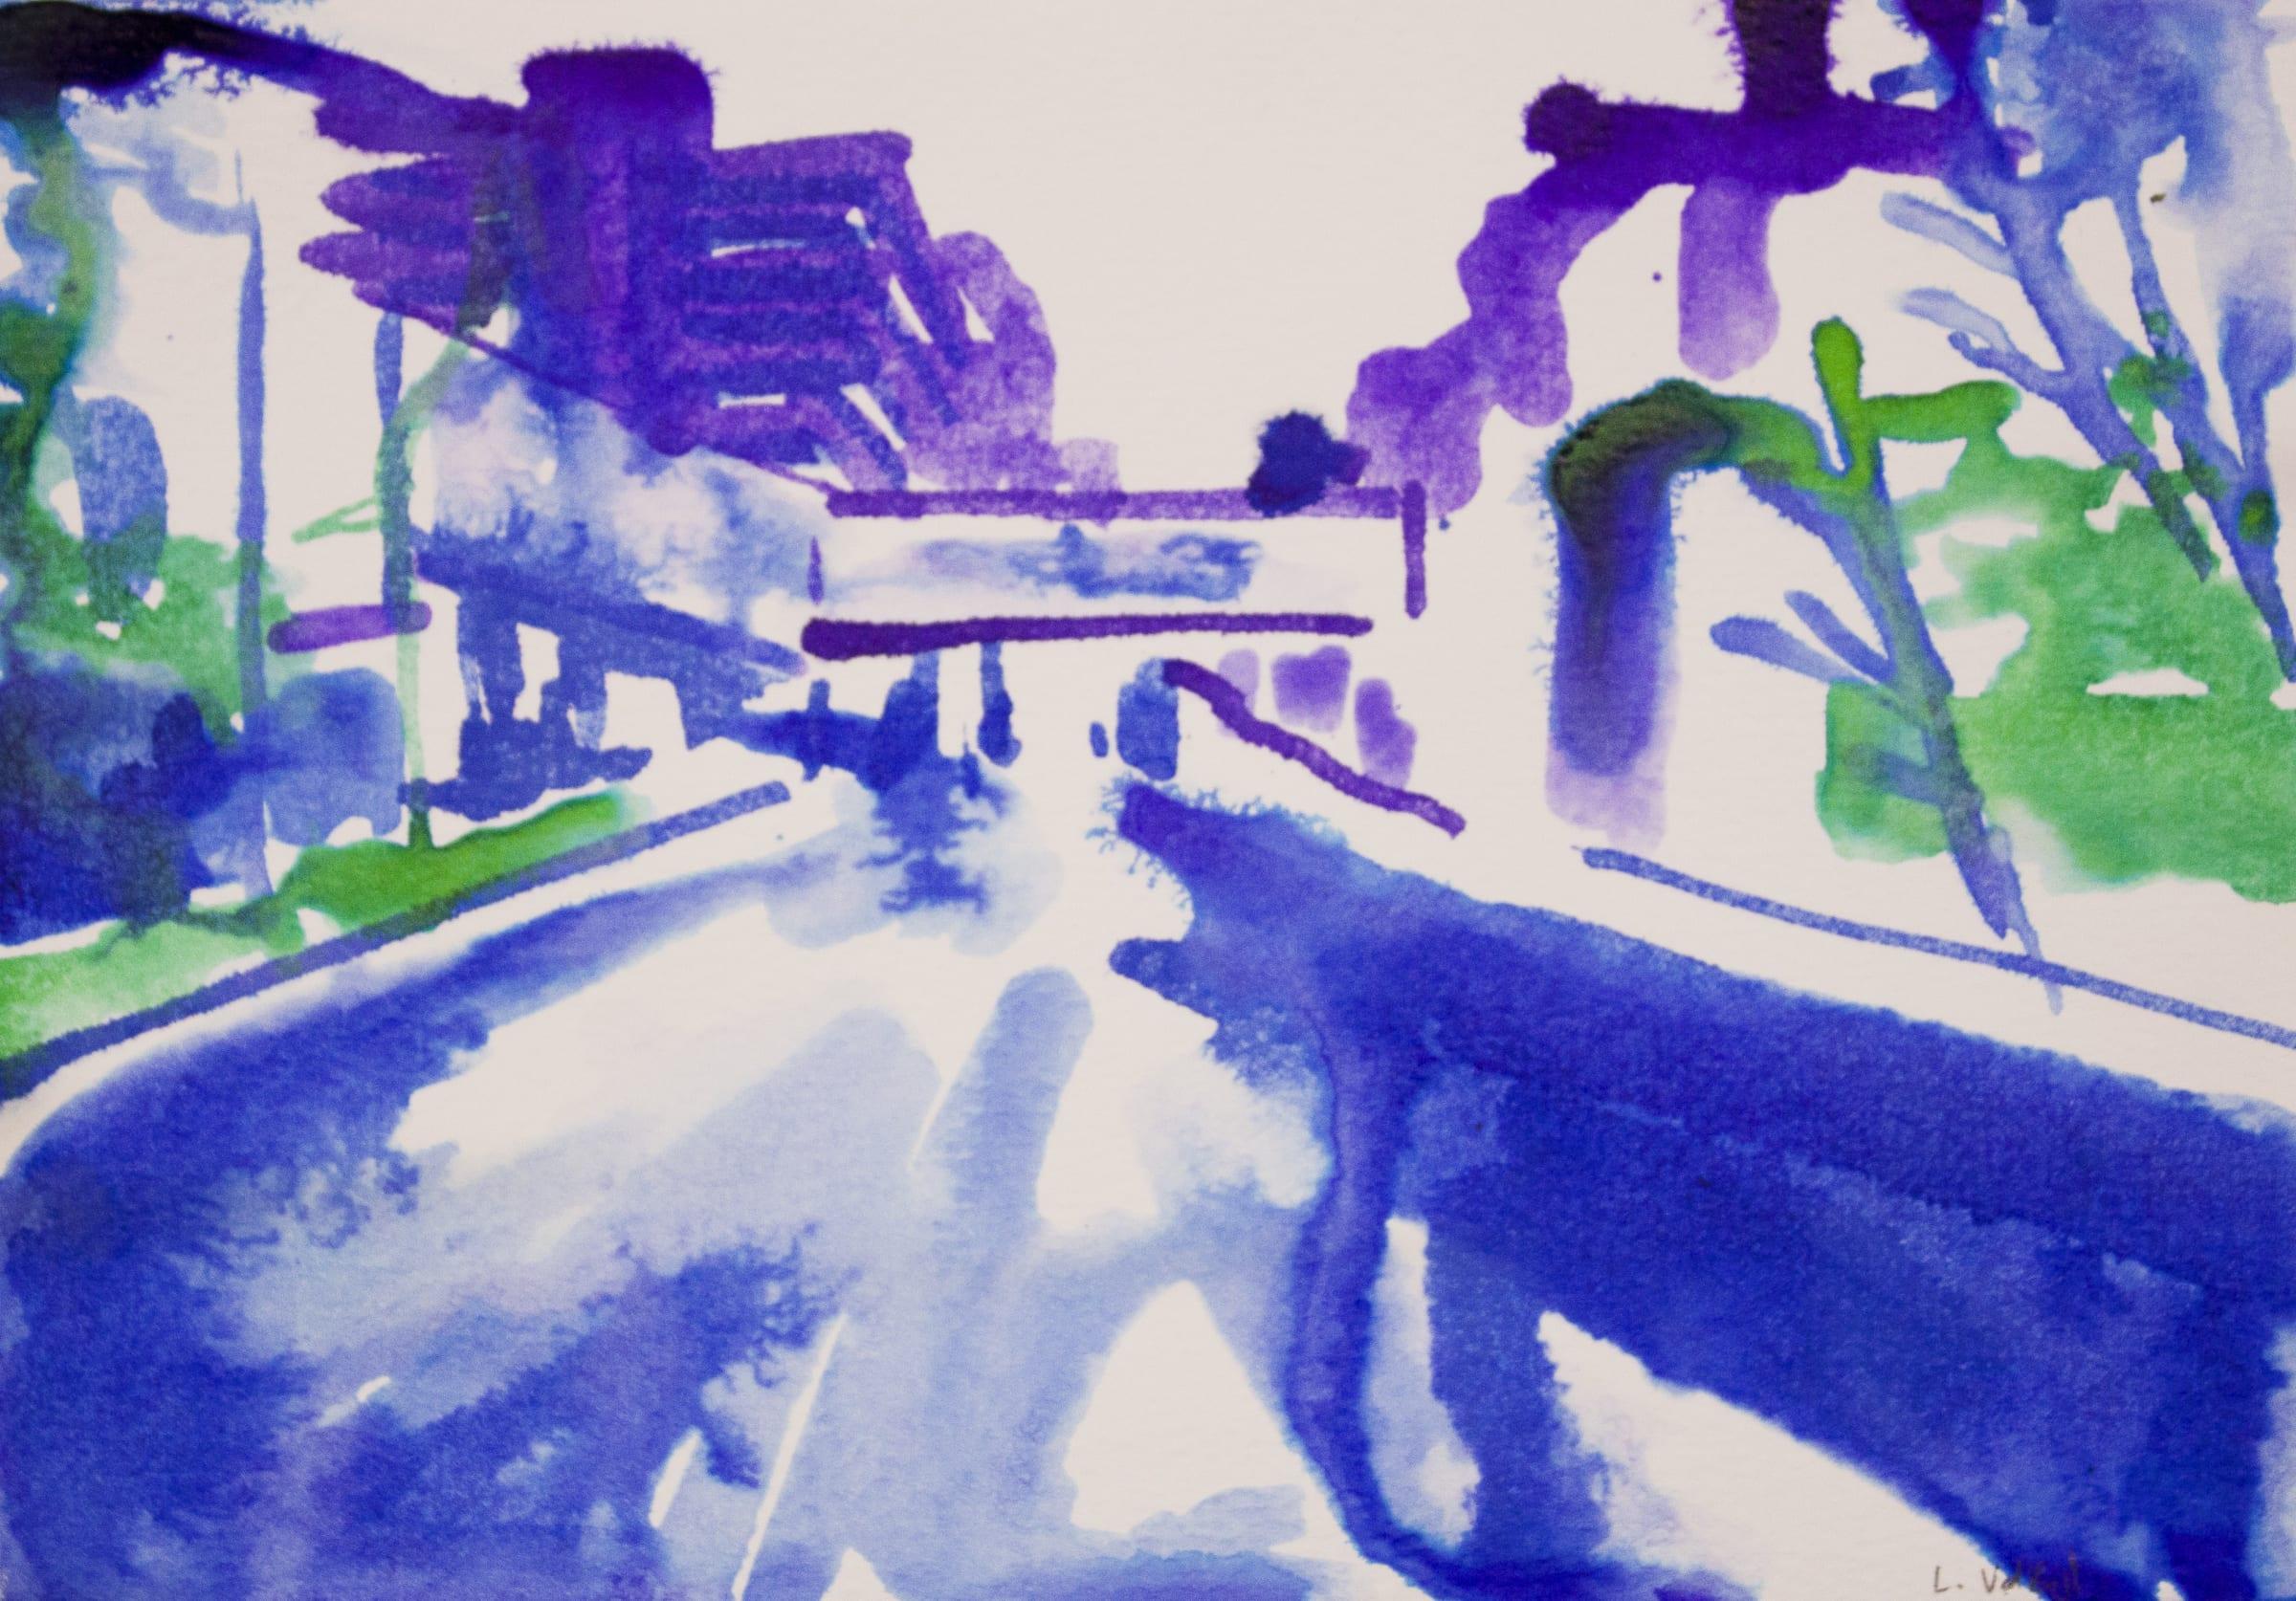 <span class=&#34;link fancybox-details-link&#34;><a href=&#34;/artists/88-louise-van-der-bijl/works/2271-louise-van-der-bijl-inktober-day-1-2018/&#34;>View Detail Page</a></span><div class=&#34;artist&#34;><strong>Louise Van Der Bijl</strong></div> <div class=&#34;title&#34;><em>Inktober Day 1</em>, 2018</div> <div class=&#34;medium&#34;>Ink On Paper</div> <div class=&#34;dimensions&#34;>14.9cm x 21.2cm</div><div class=&#34;price&#34;>R400.00</div>